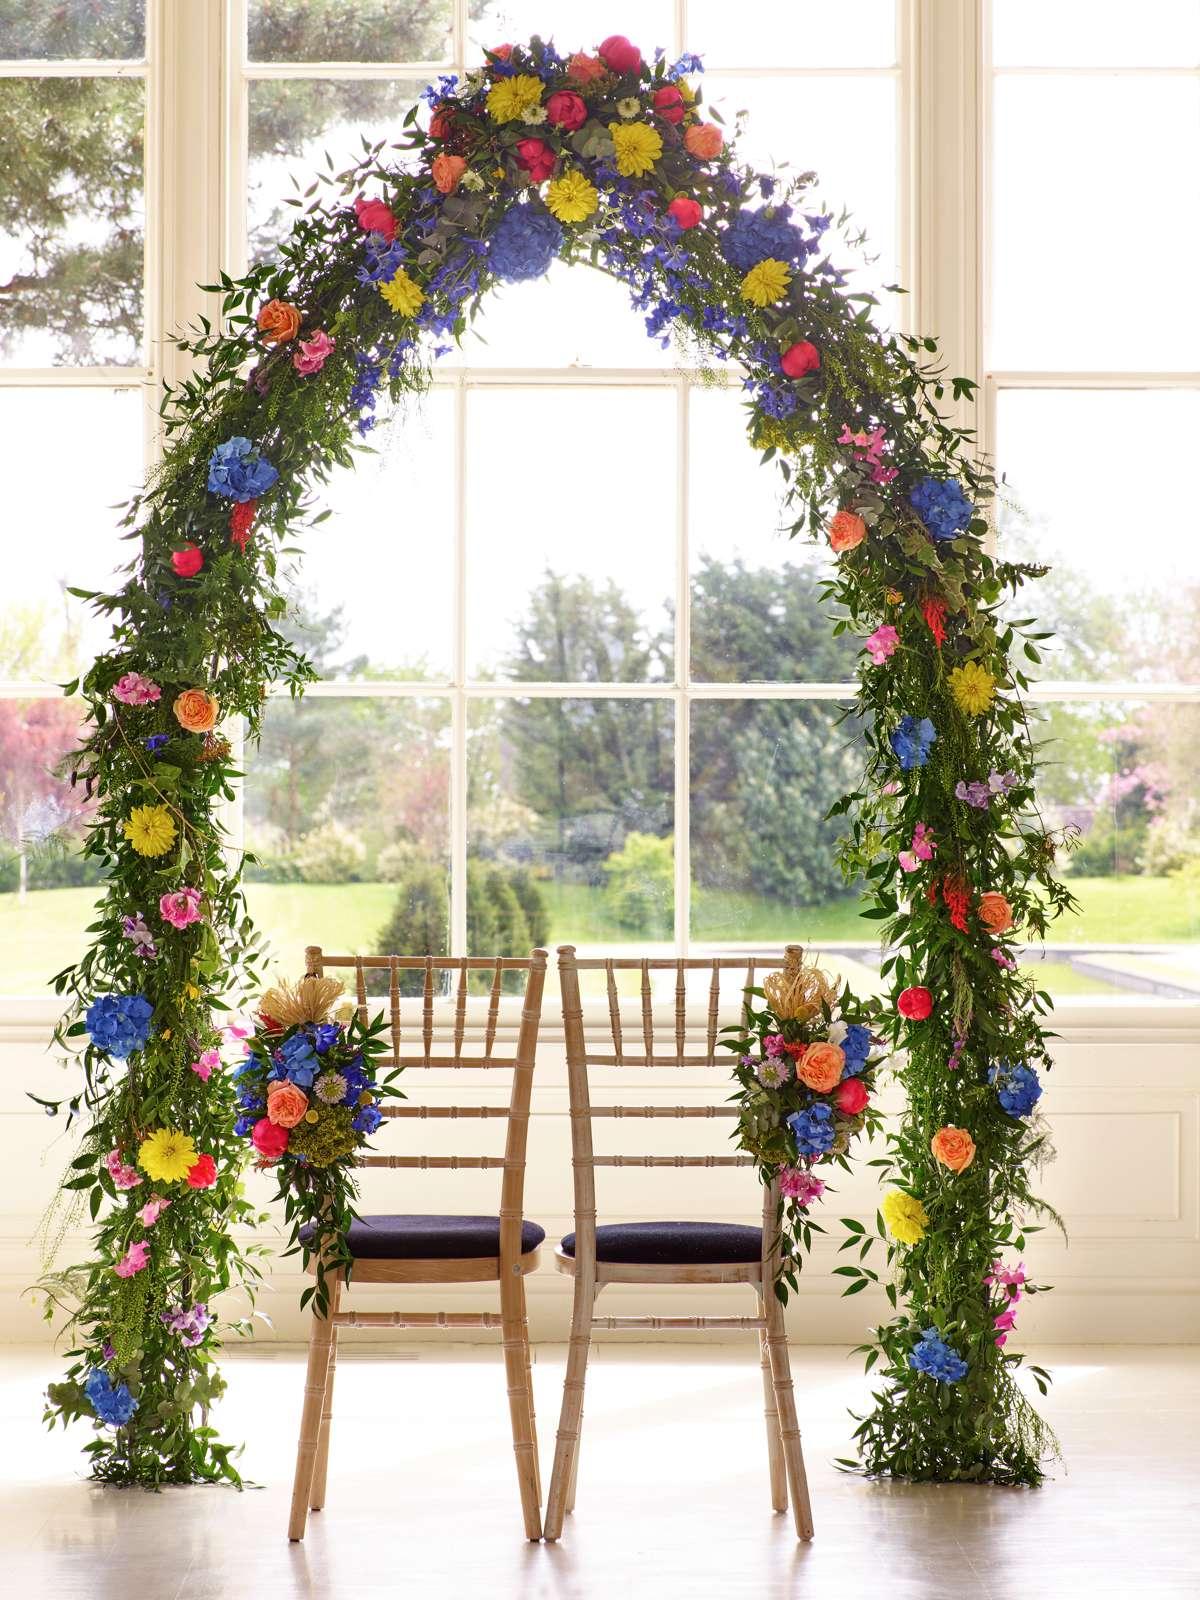 Interflora Wedding Inspired Shoot - Summer Flowers (Decor) (Ceremony) (Floral Arch) (4)